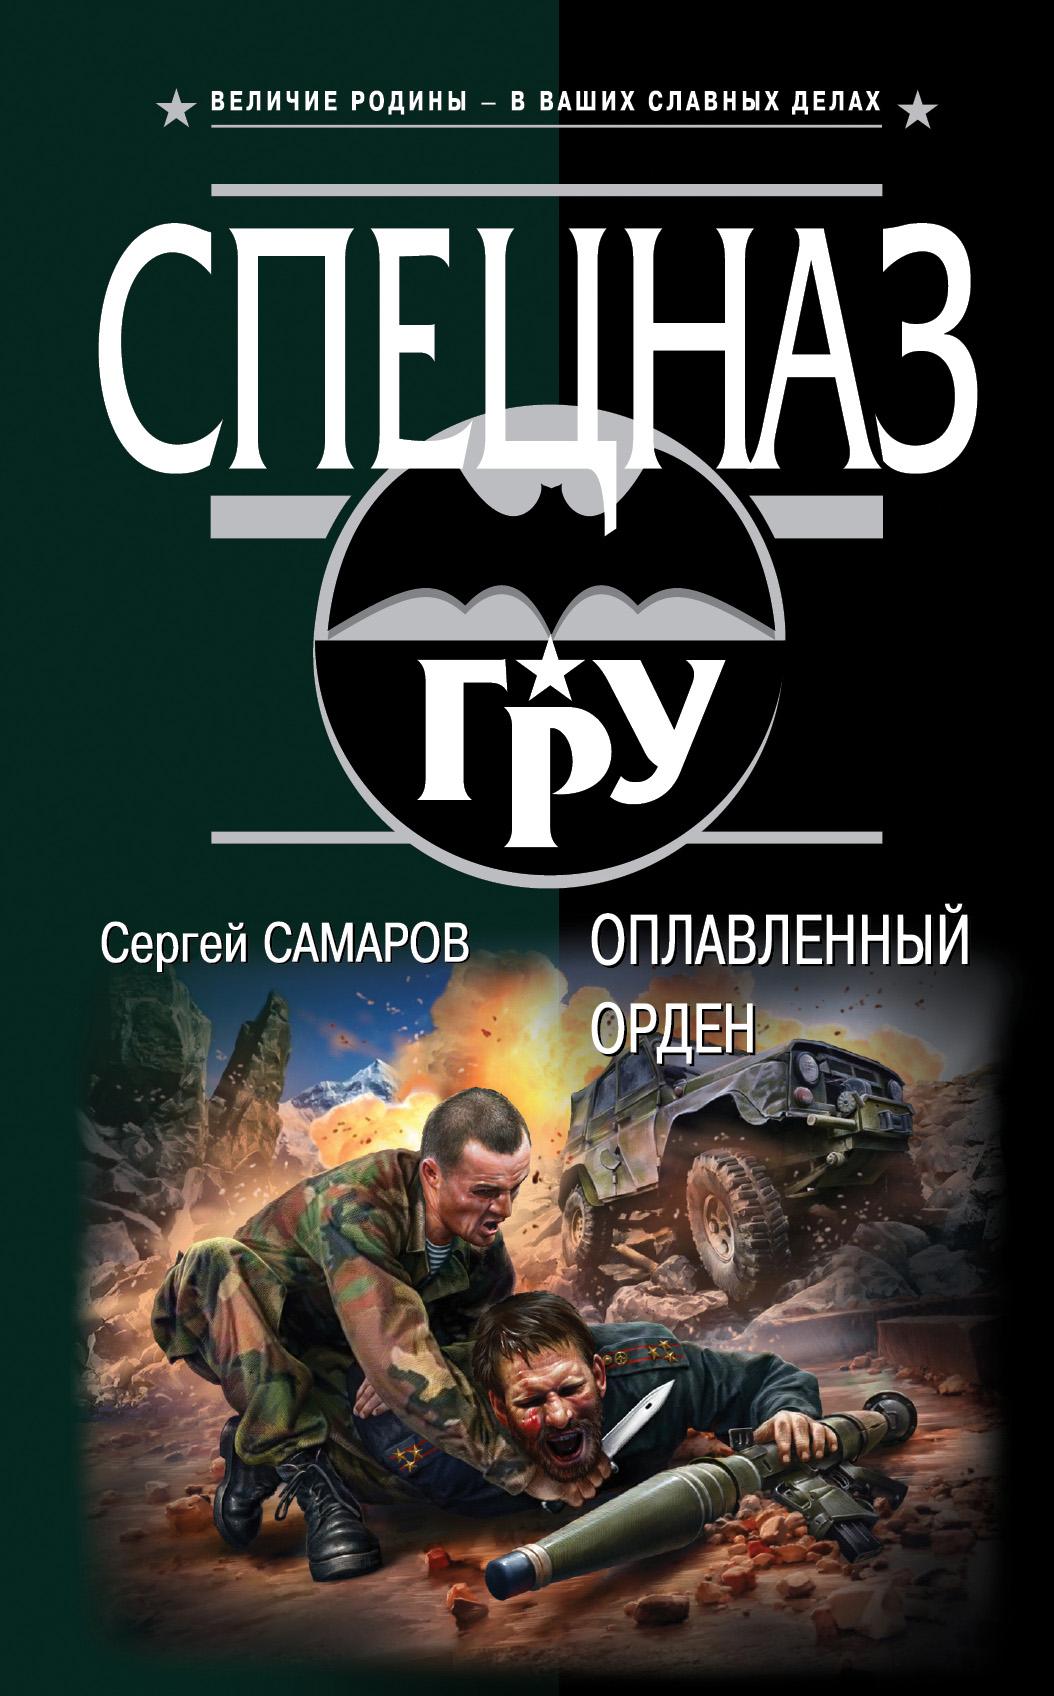 Сергей Самаров Оплавленный орден самаров с оплавленный орден isbn 9785699654475